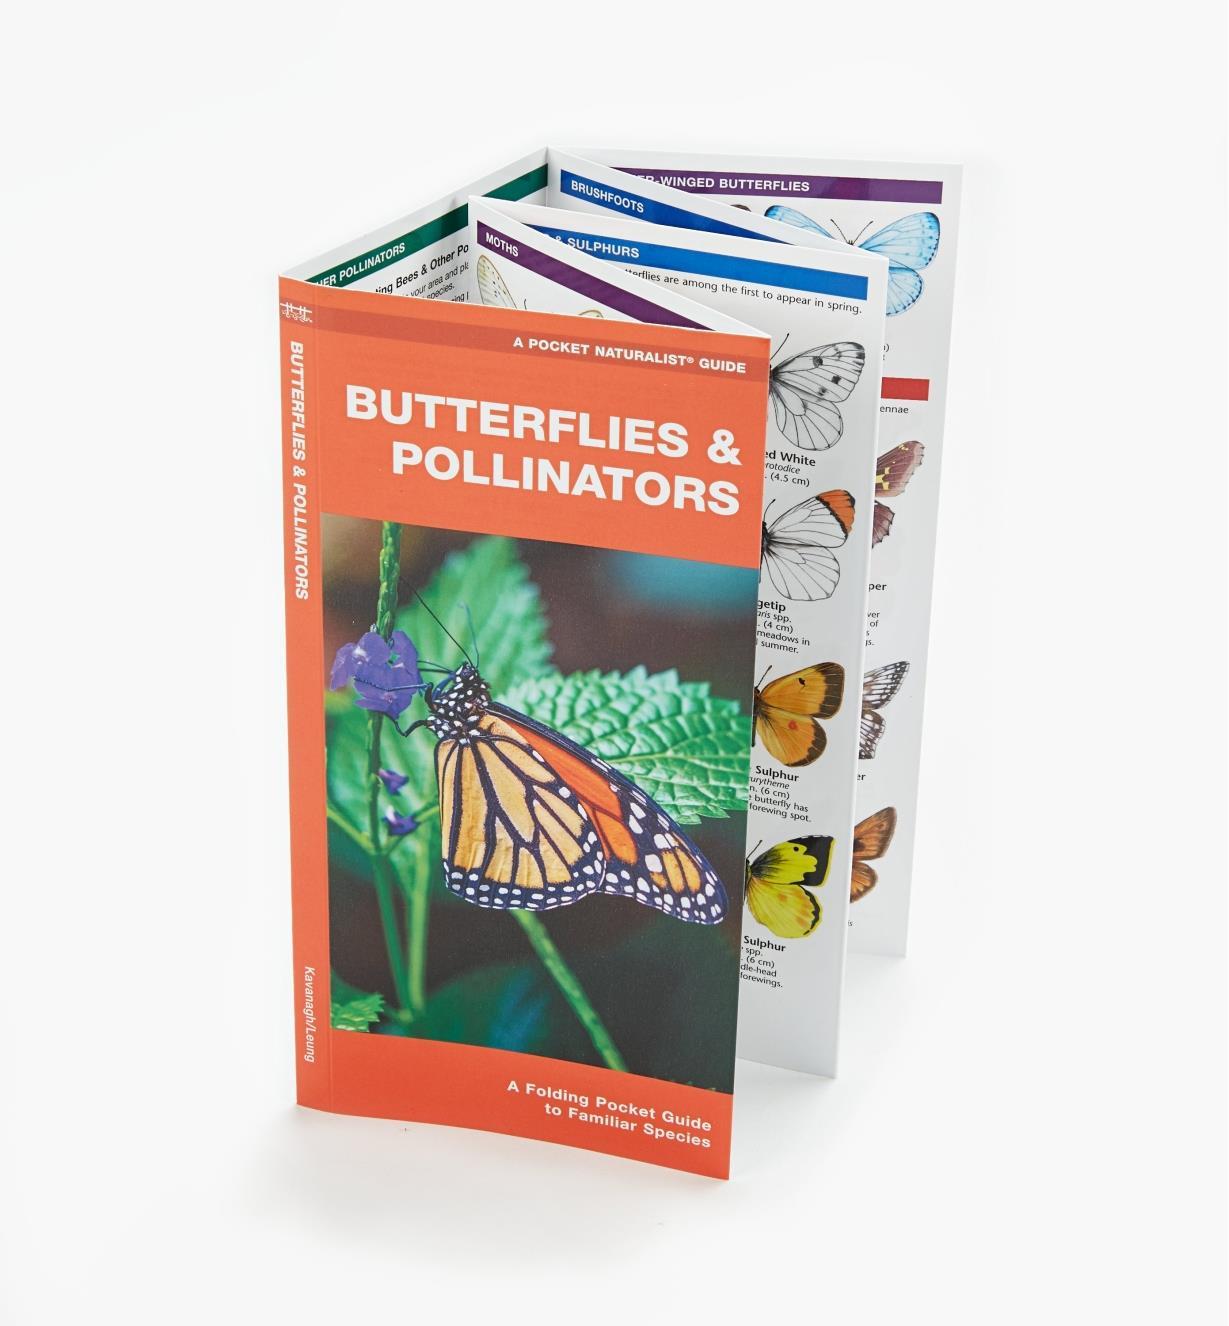 LA269 - Butterflies & Pollinators